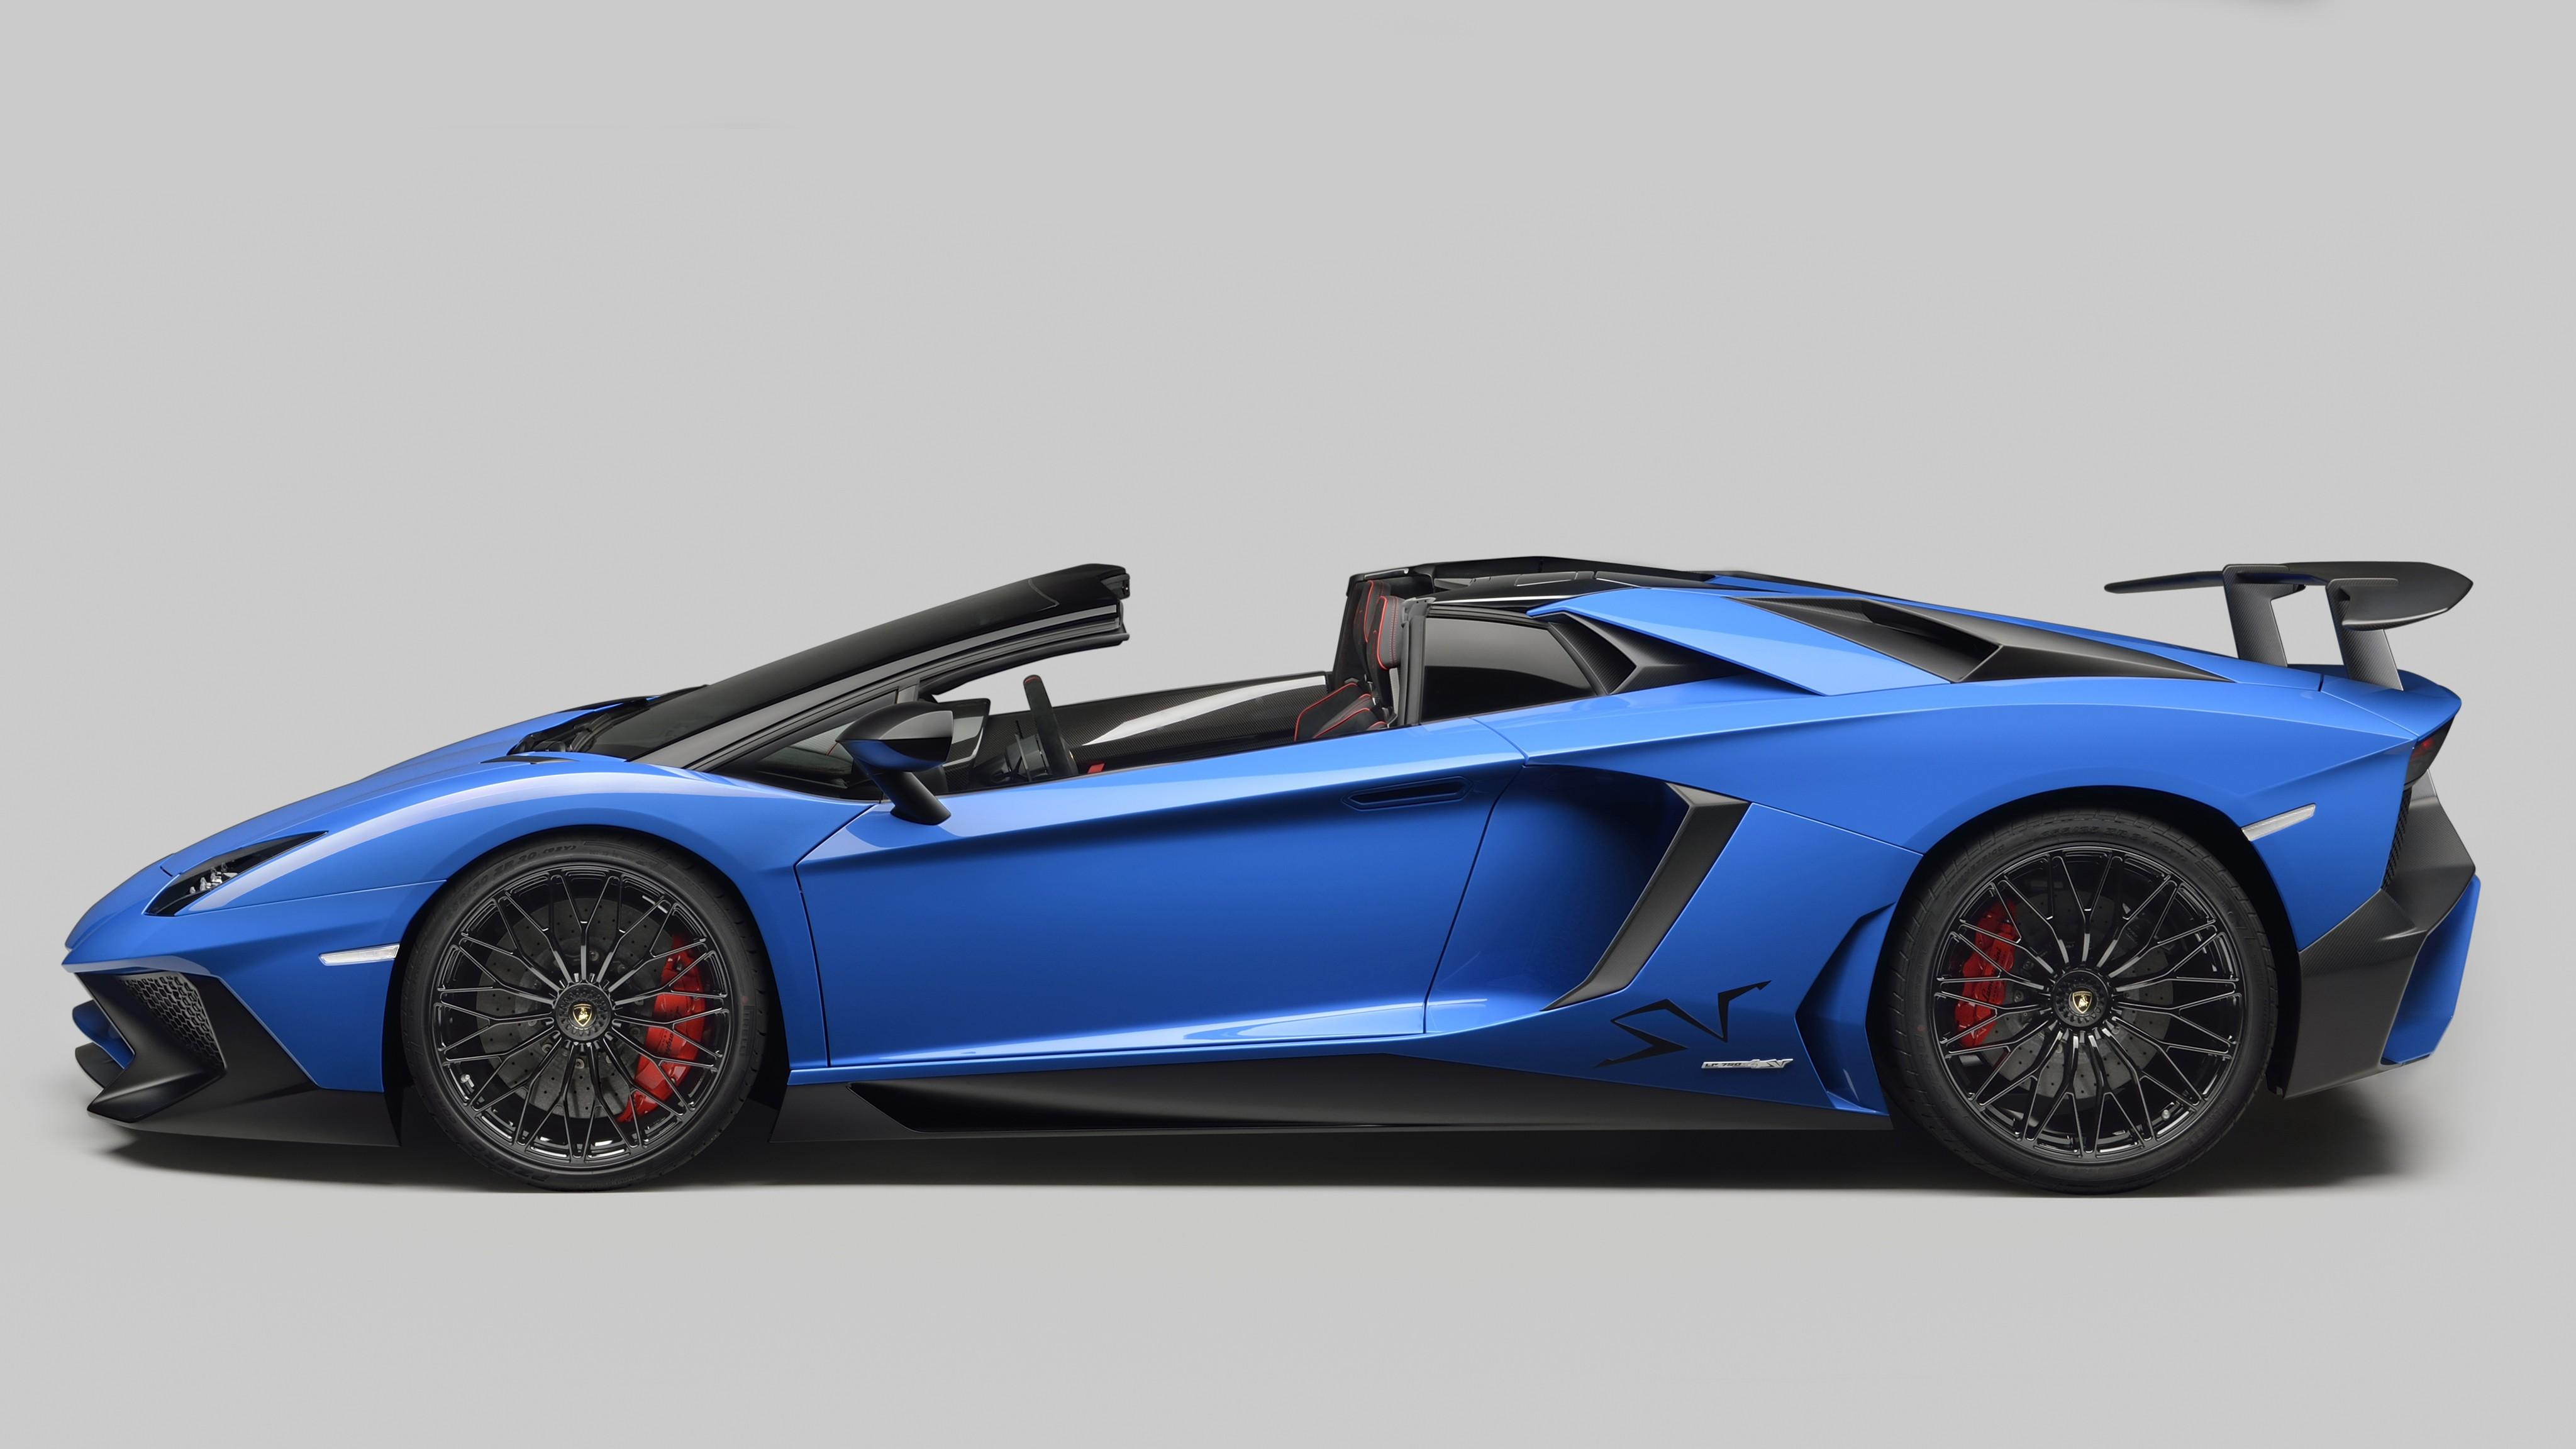 Lamborghini Aventador Lp750 4 Sv Roadster Specs Amp Photos